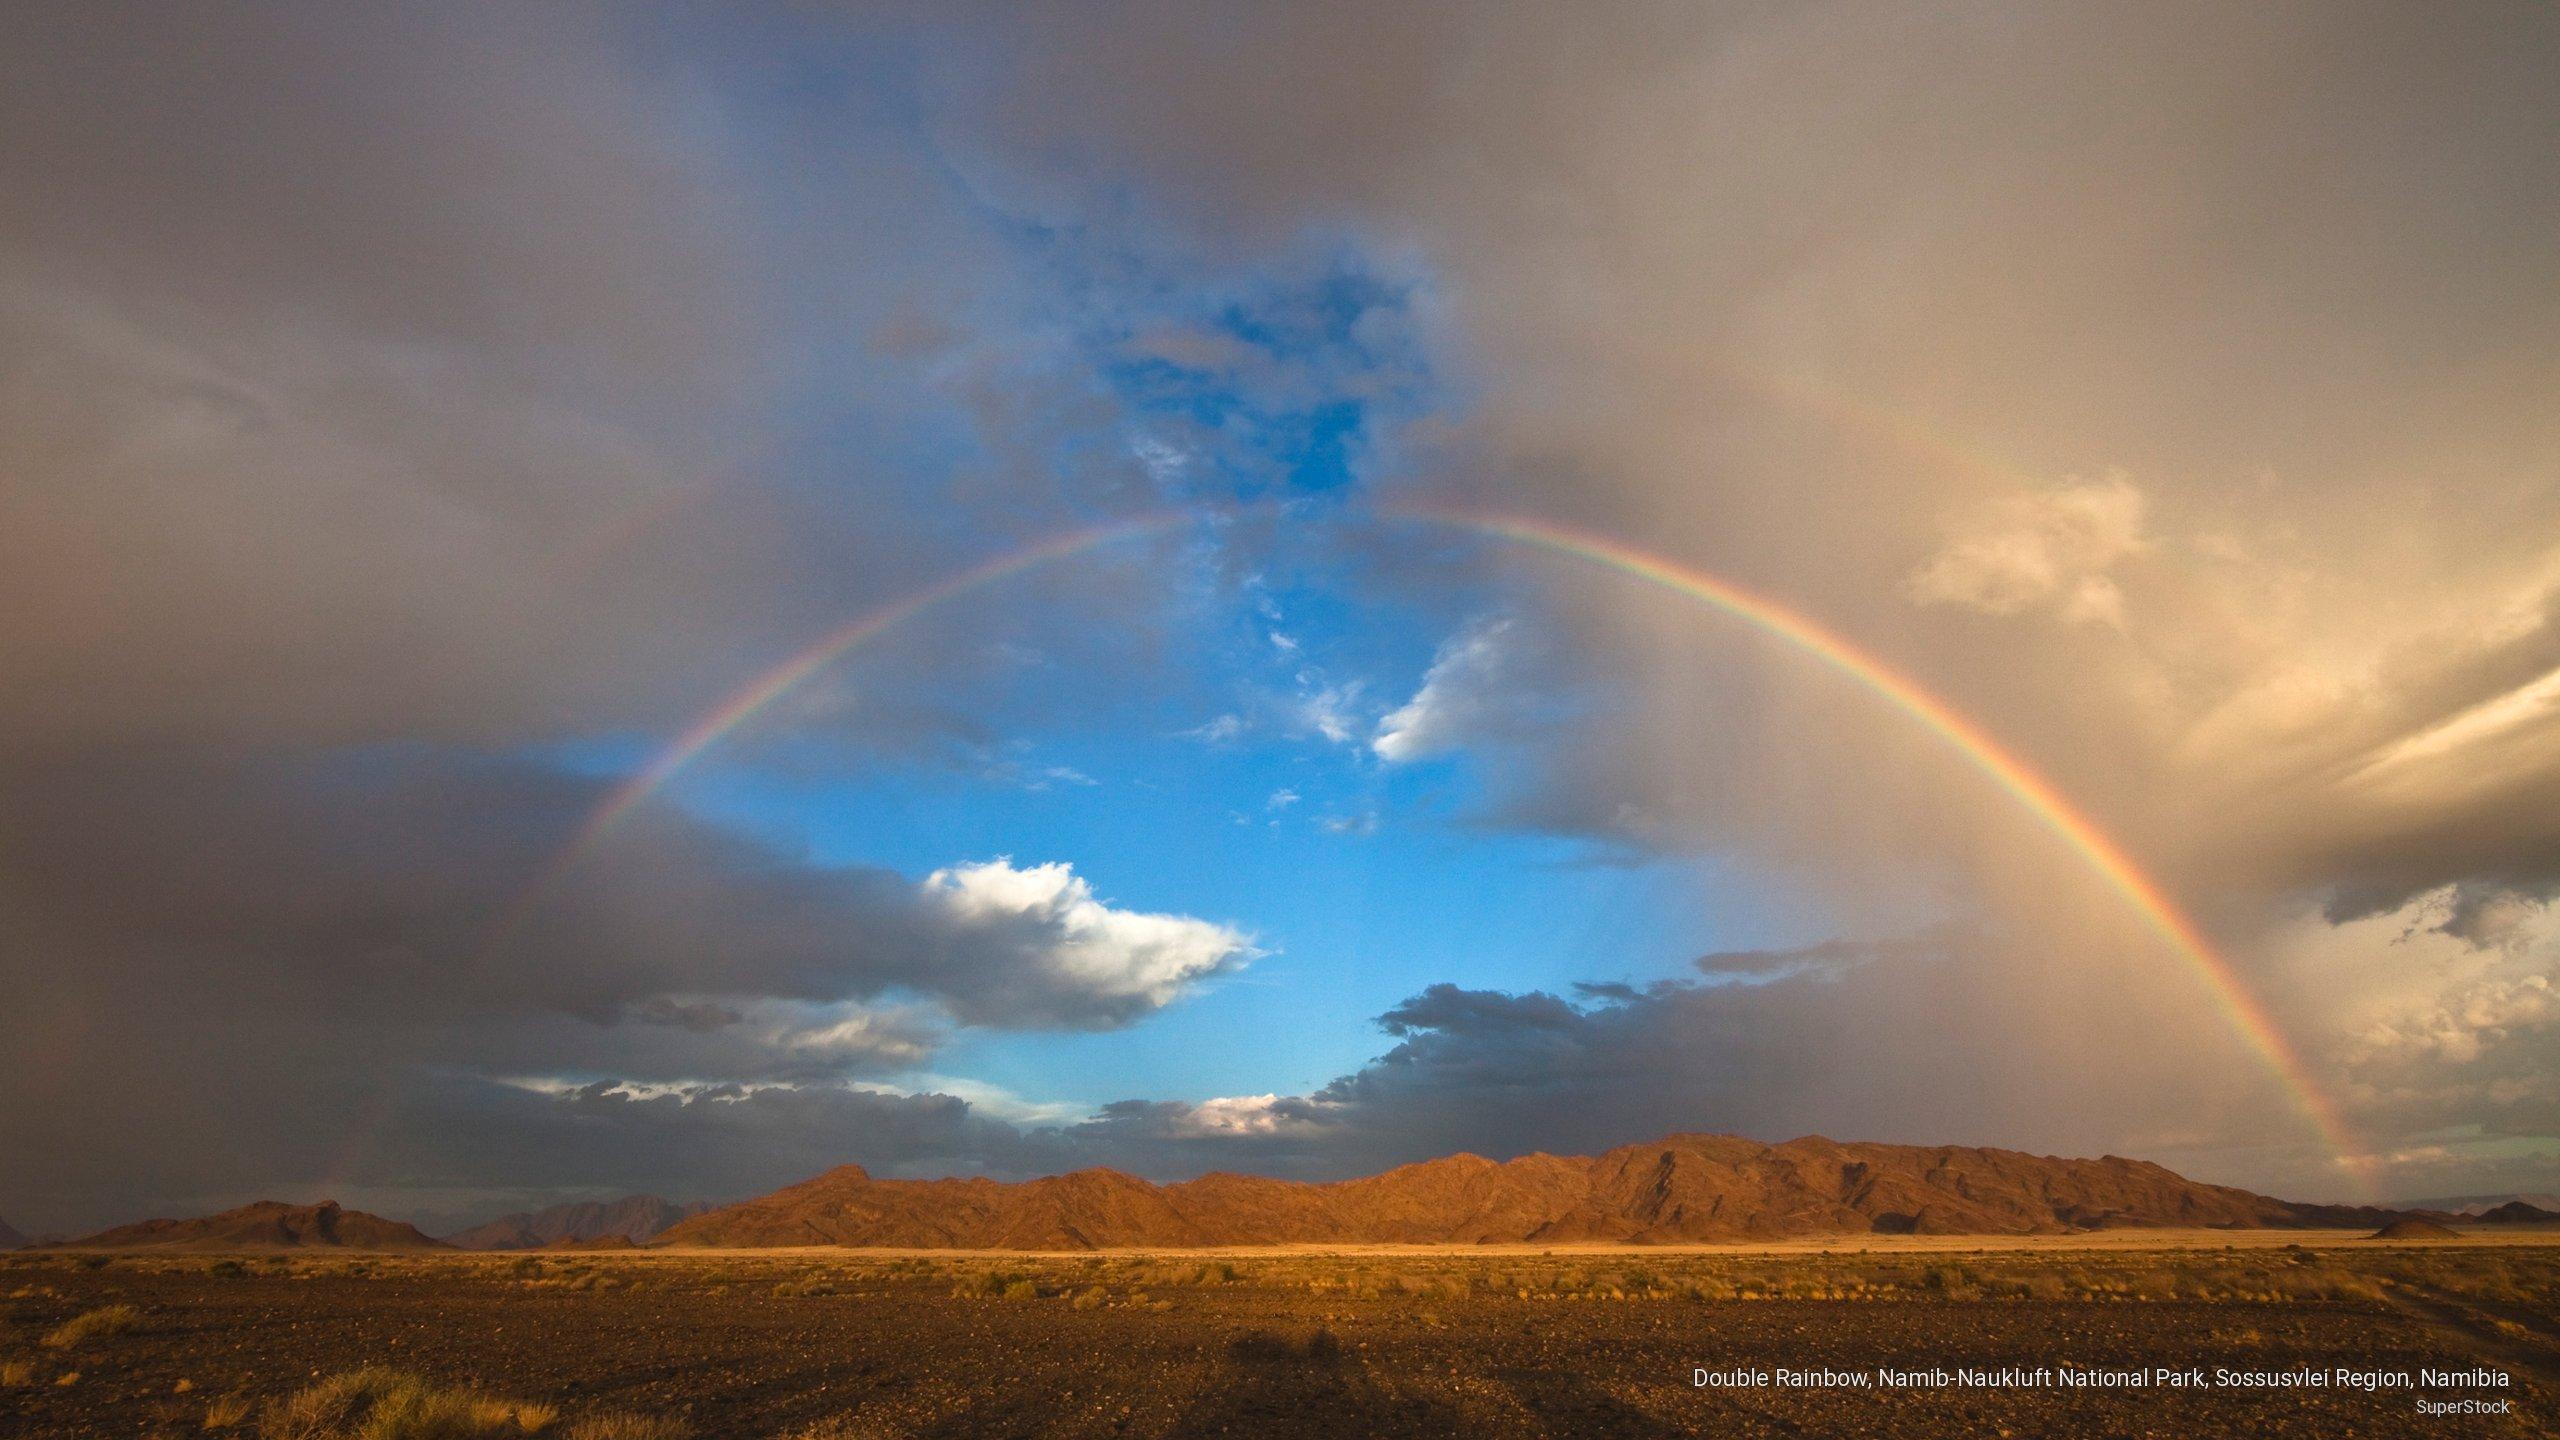 Double Rainbow, Namib-Naukluft National Park, Sossusvlei Region, Namibia